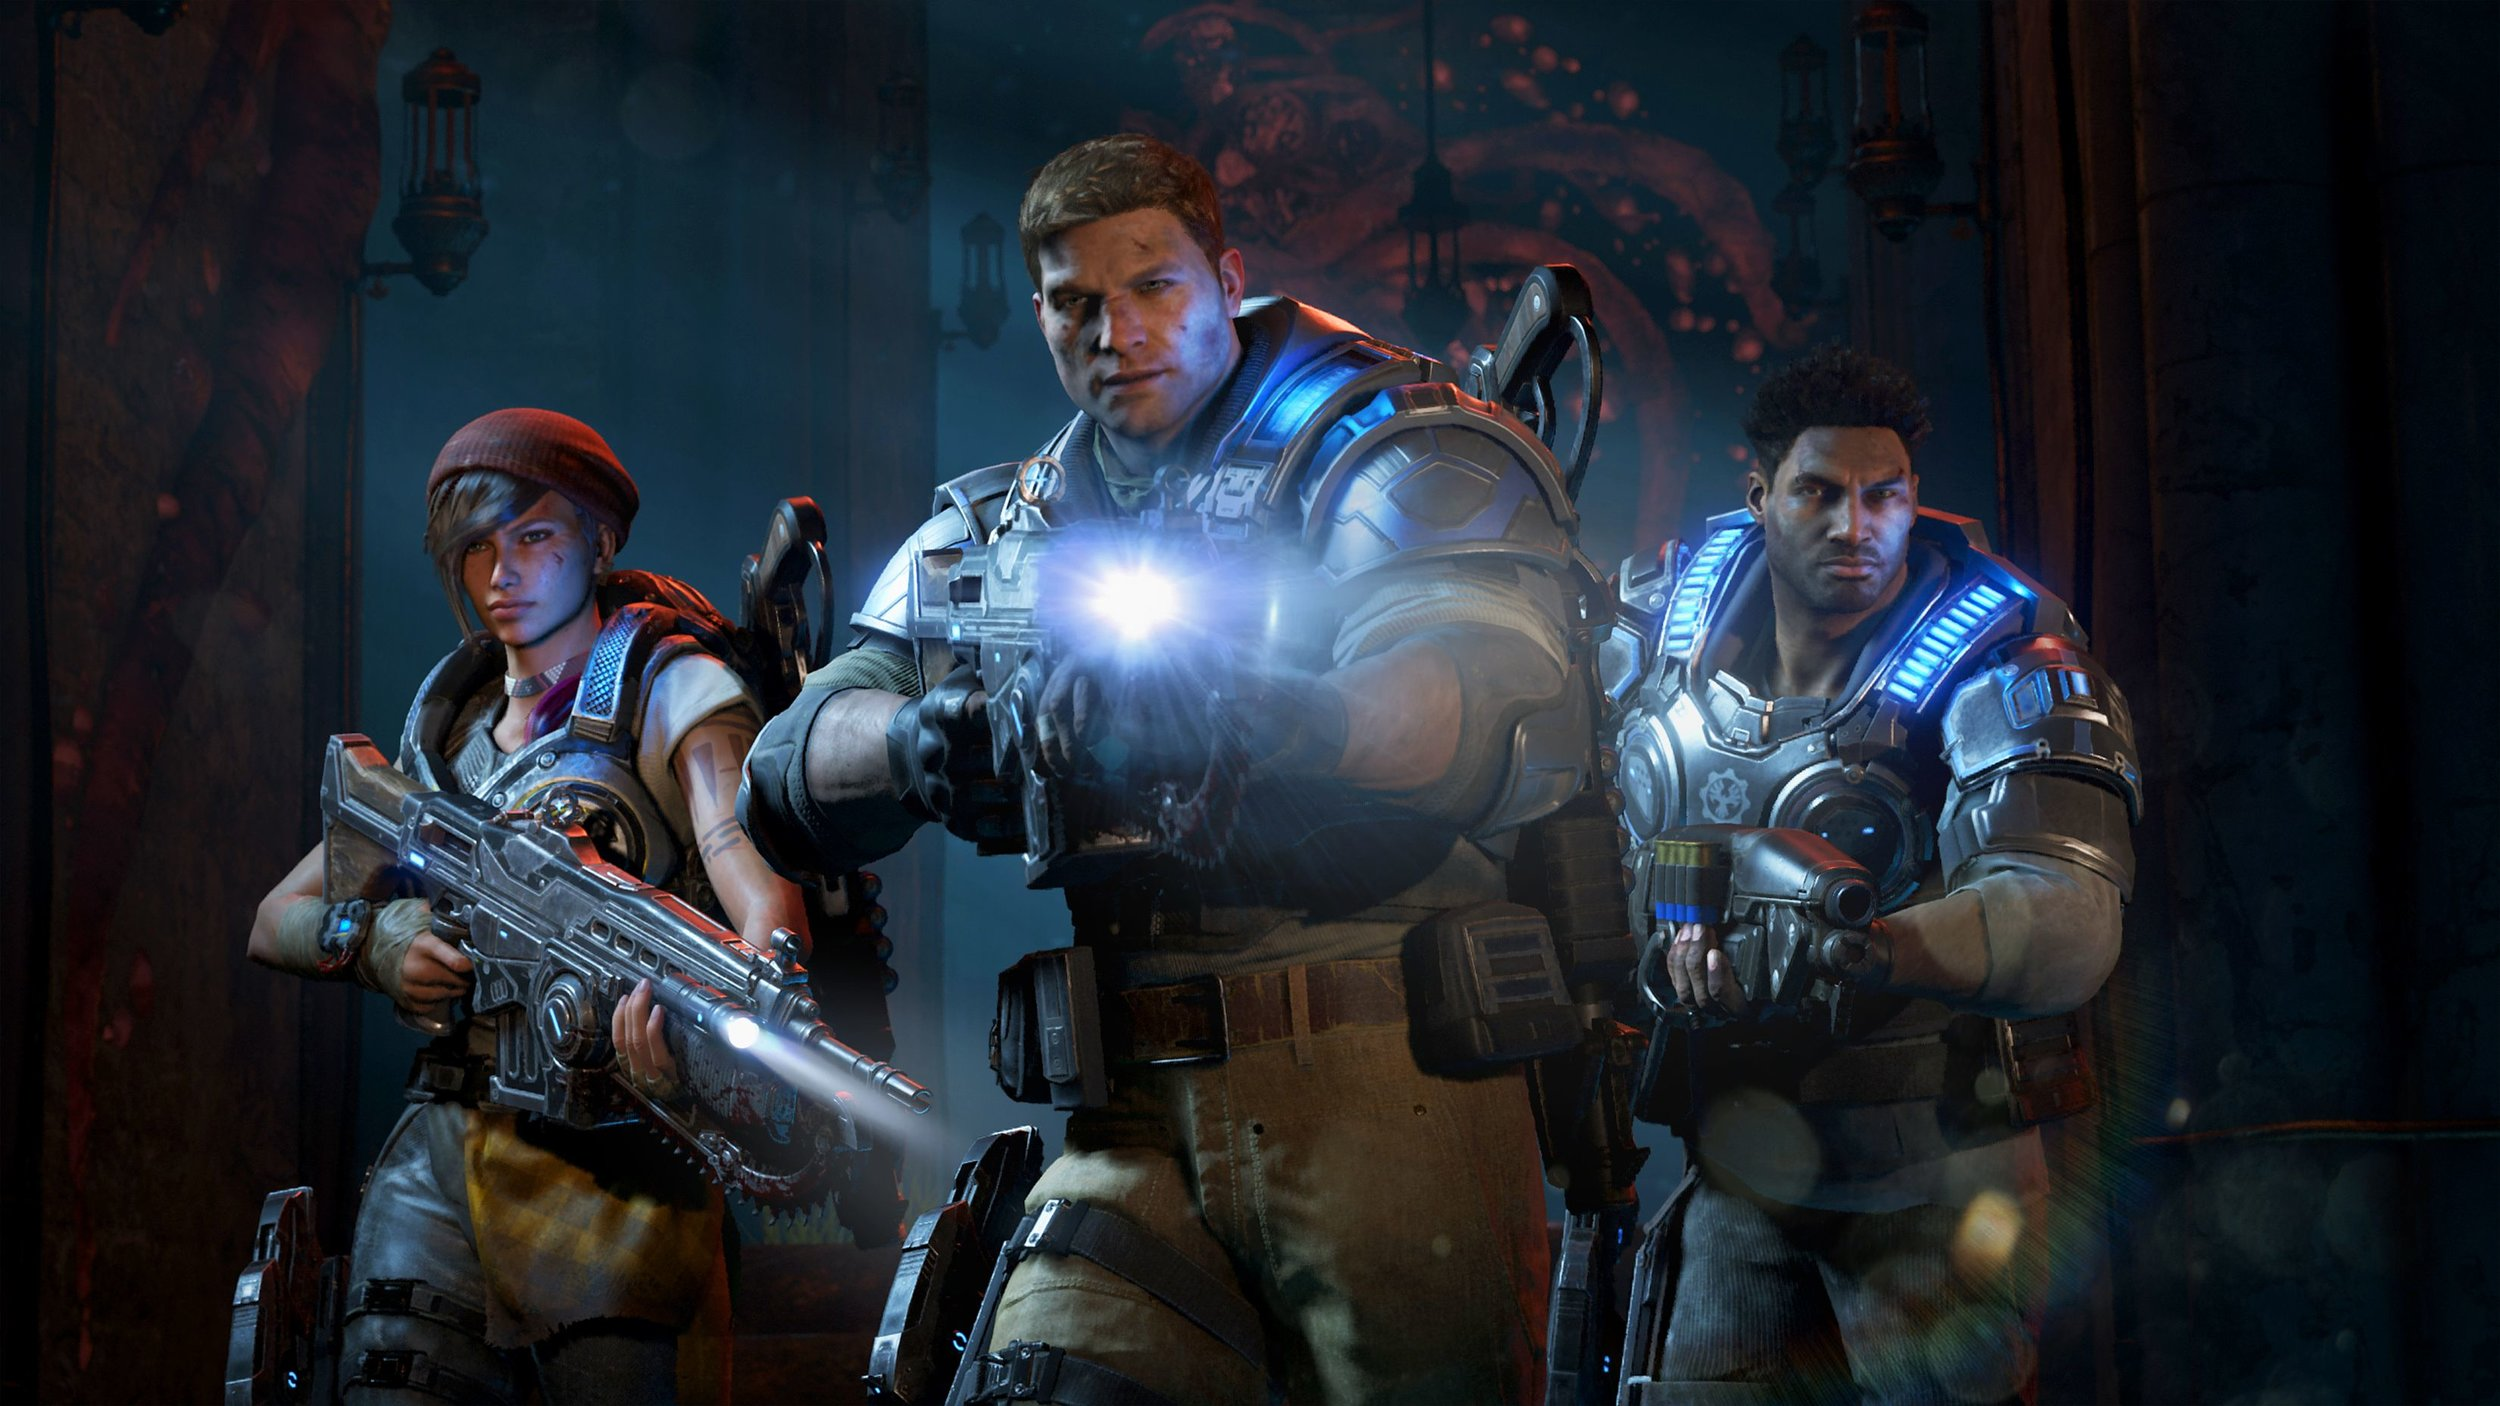 Gears-of-War-4_Heroes_Final.jpg